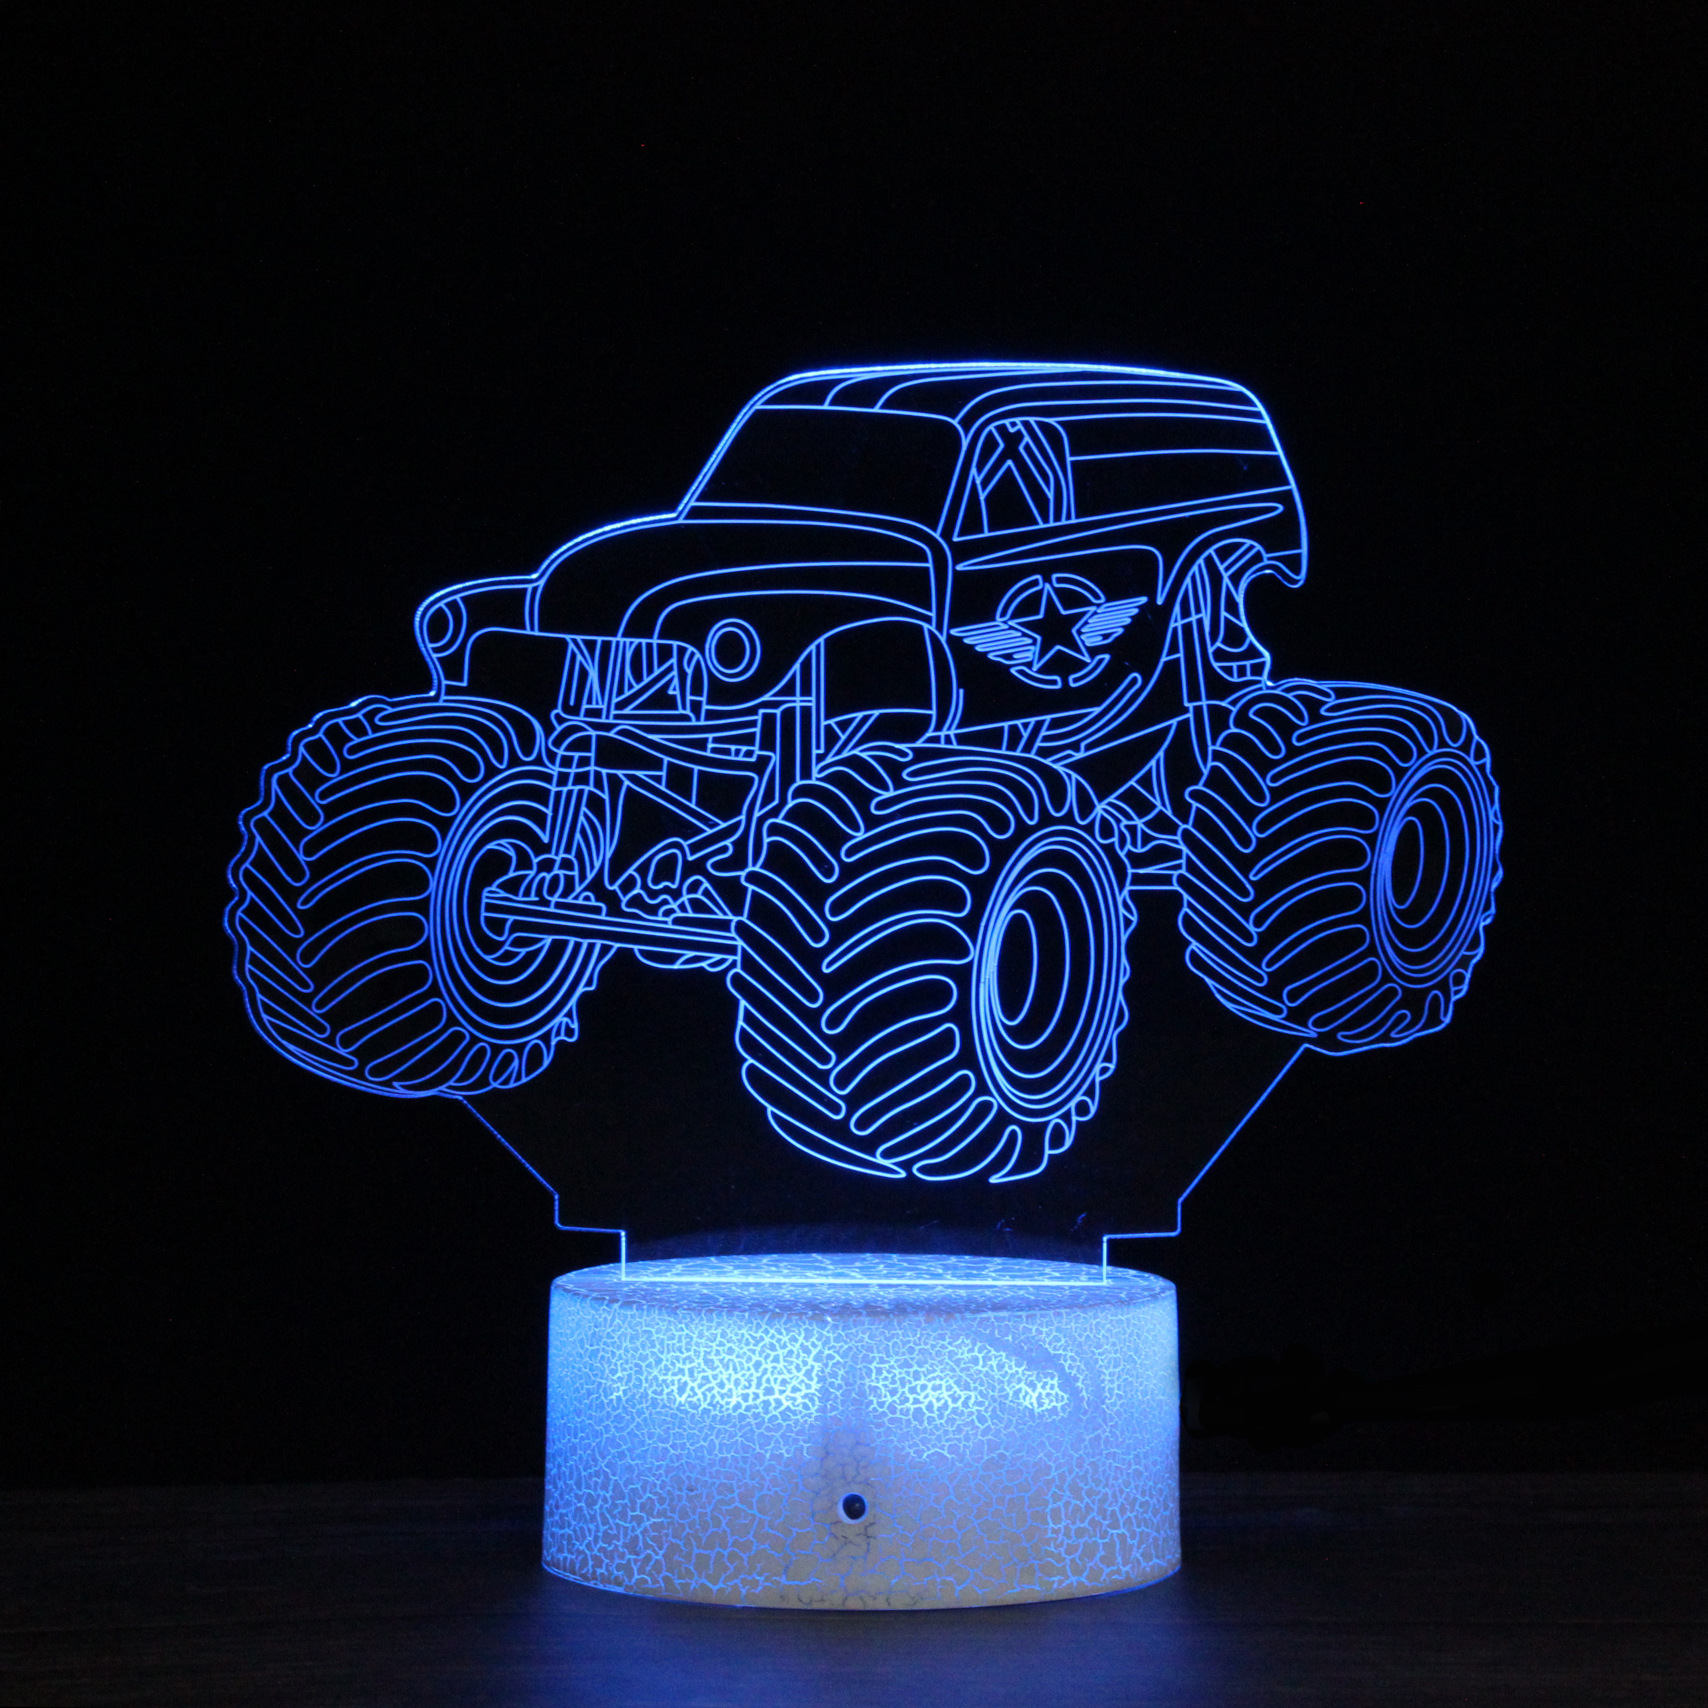 Creative 3D Car Night Light 7 Colors LED Lamp Decoration Light Table Desk Lamp Touch Switch Rainbow Color Change